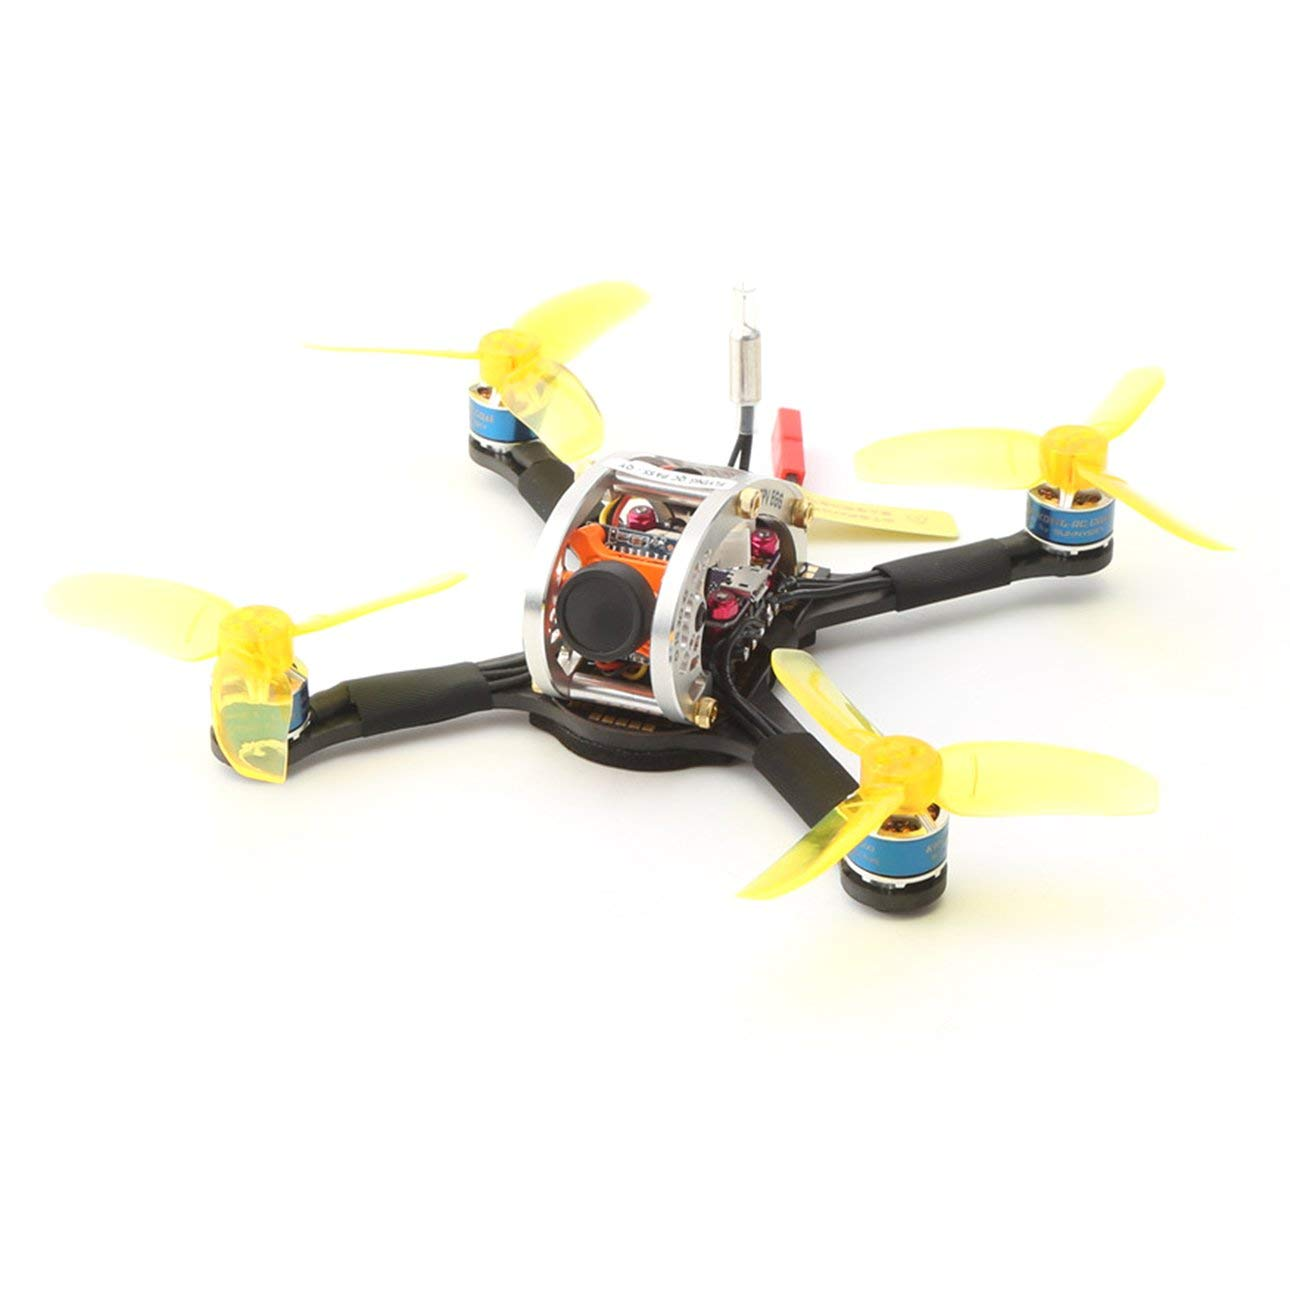 Drohne mit Kamera LDARC FPVEGG V2 5.8G Brushless OSD Cam AC900 RX Mini FPV RC Racing Drone PNP von Ballylyly